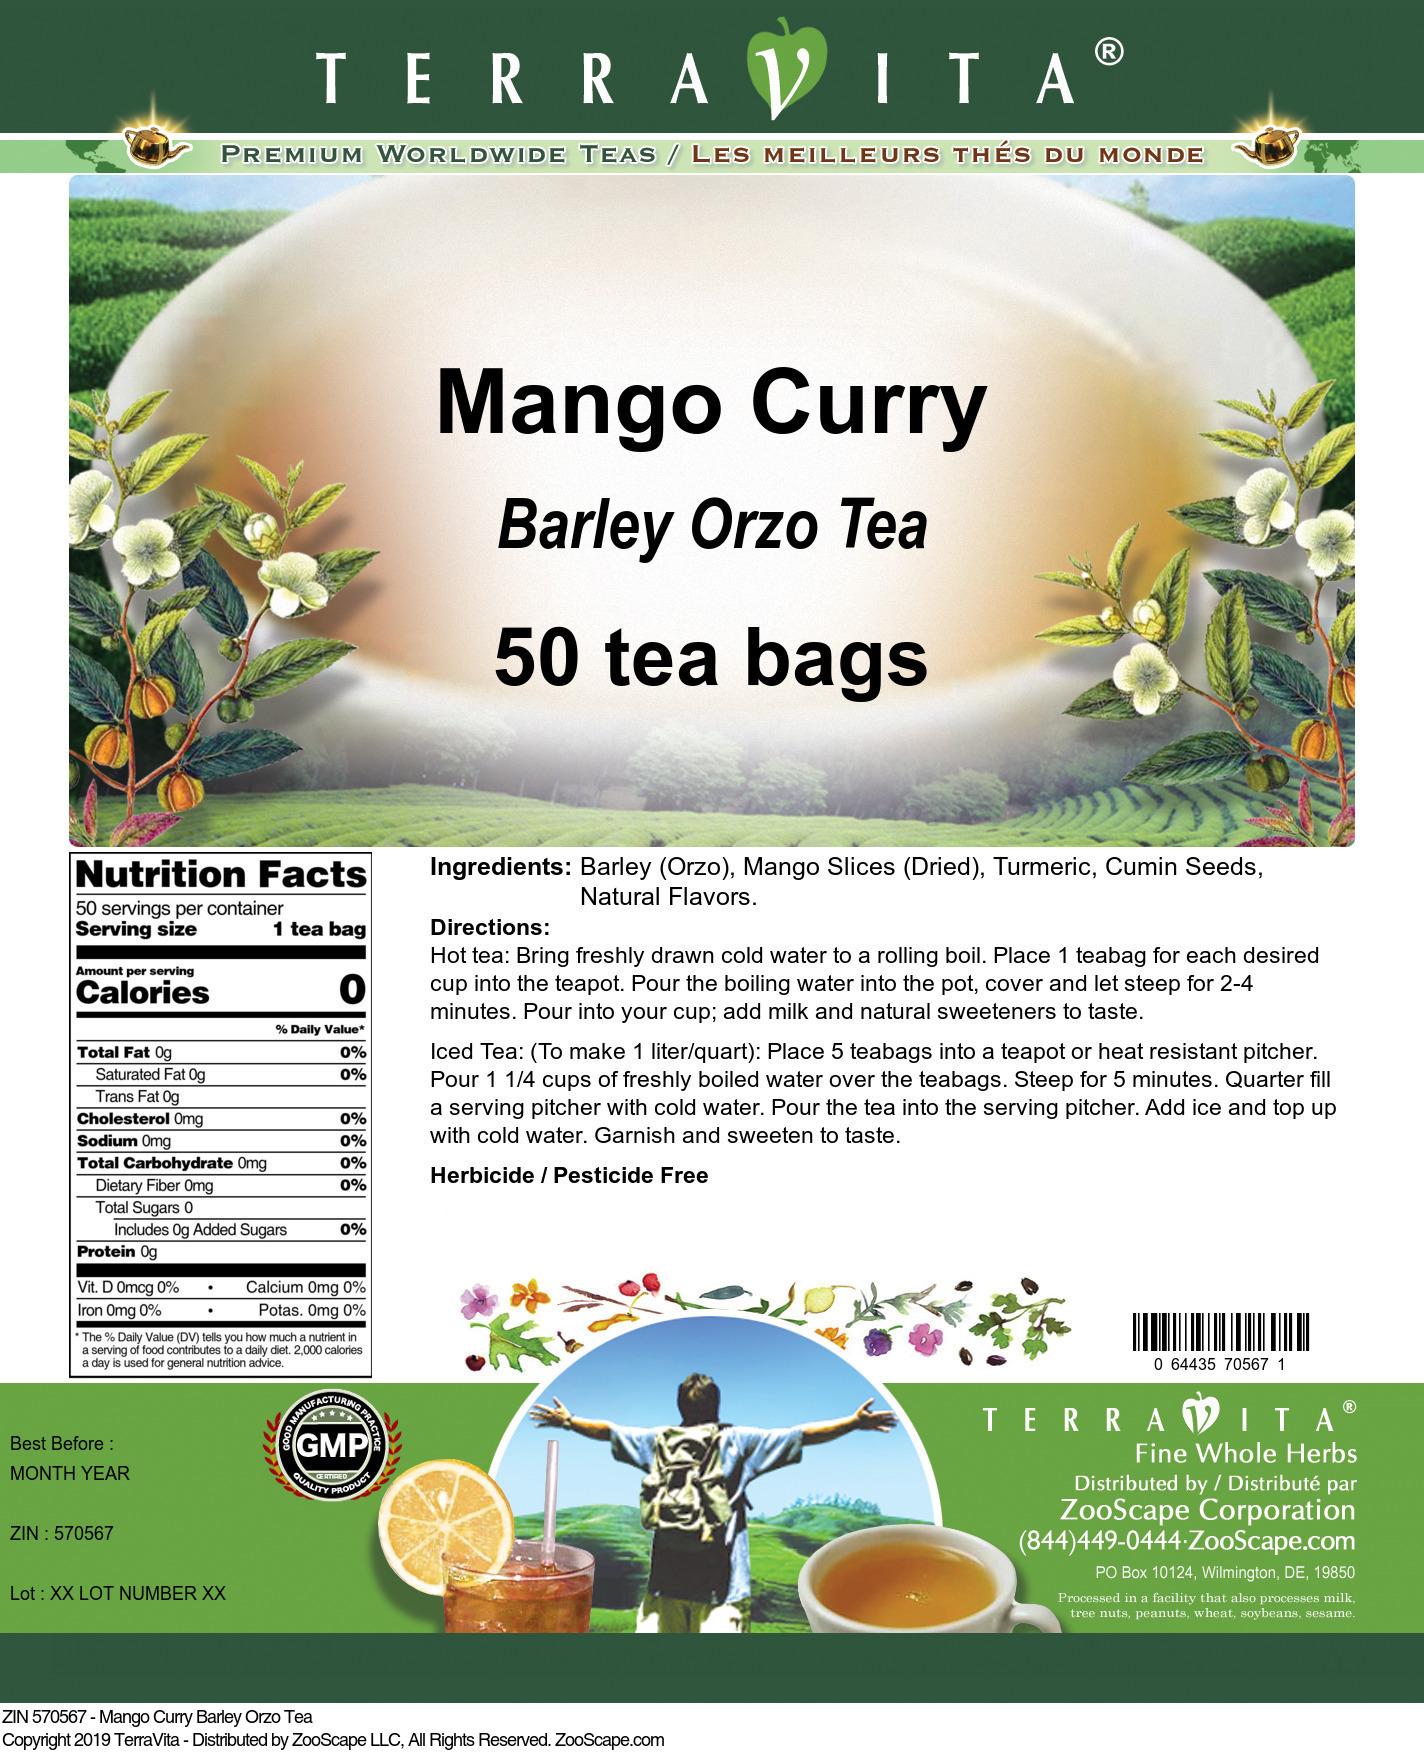 Mango Curry Barley Orzo